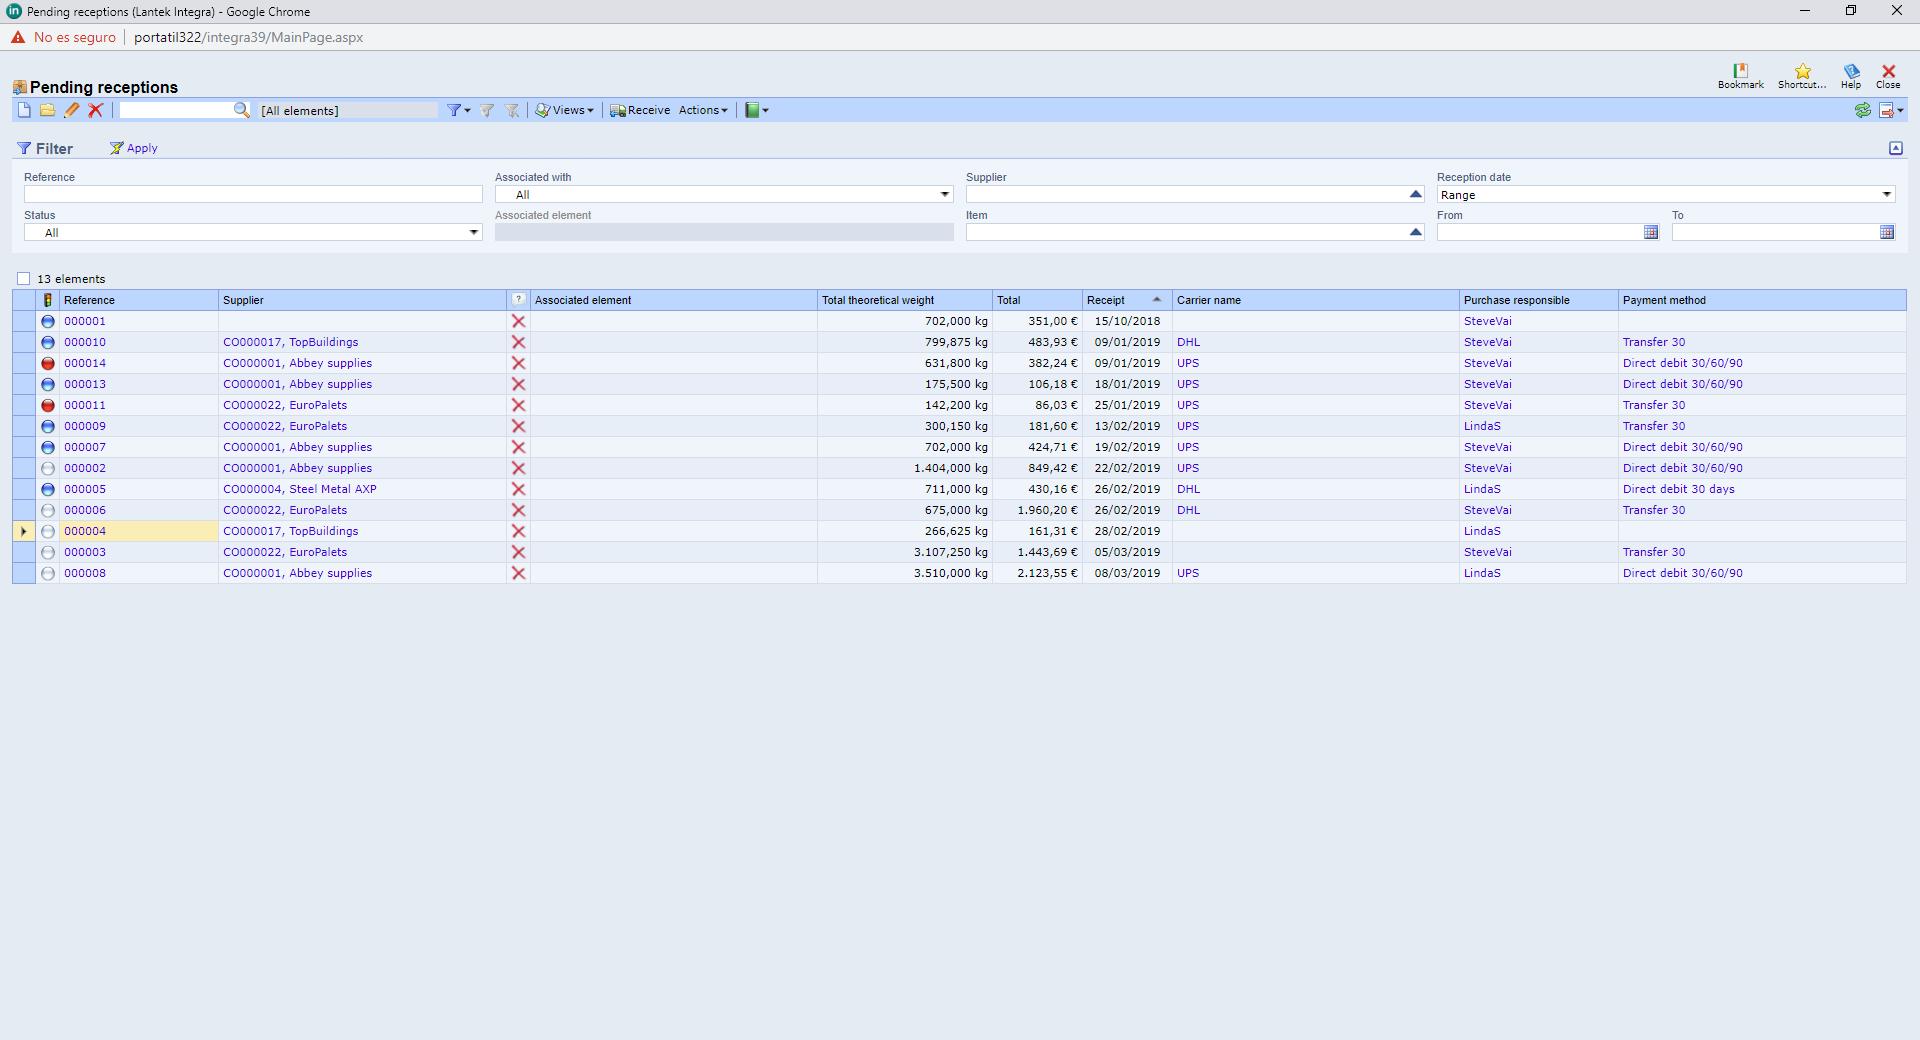 Lantek integra Inventory  - Pending receipts